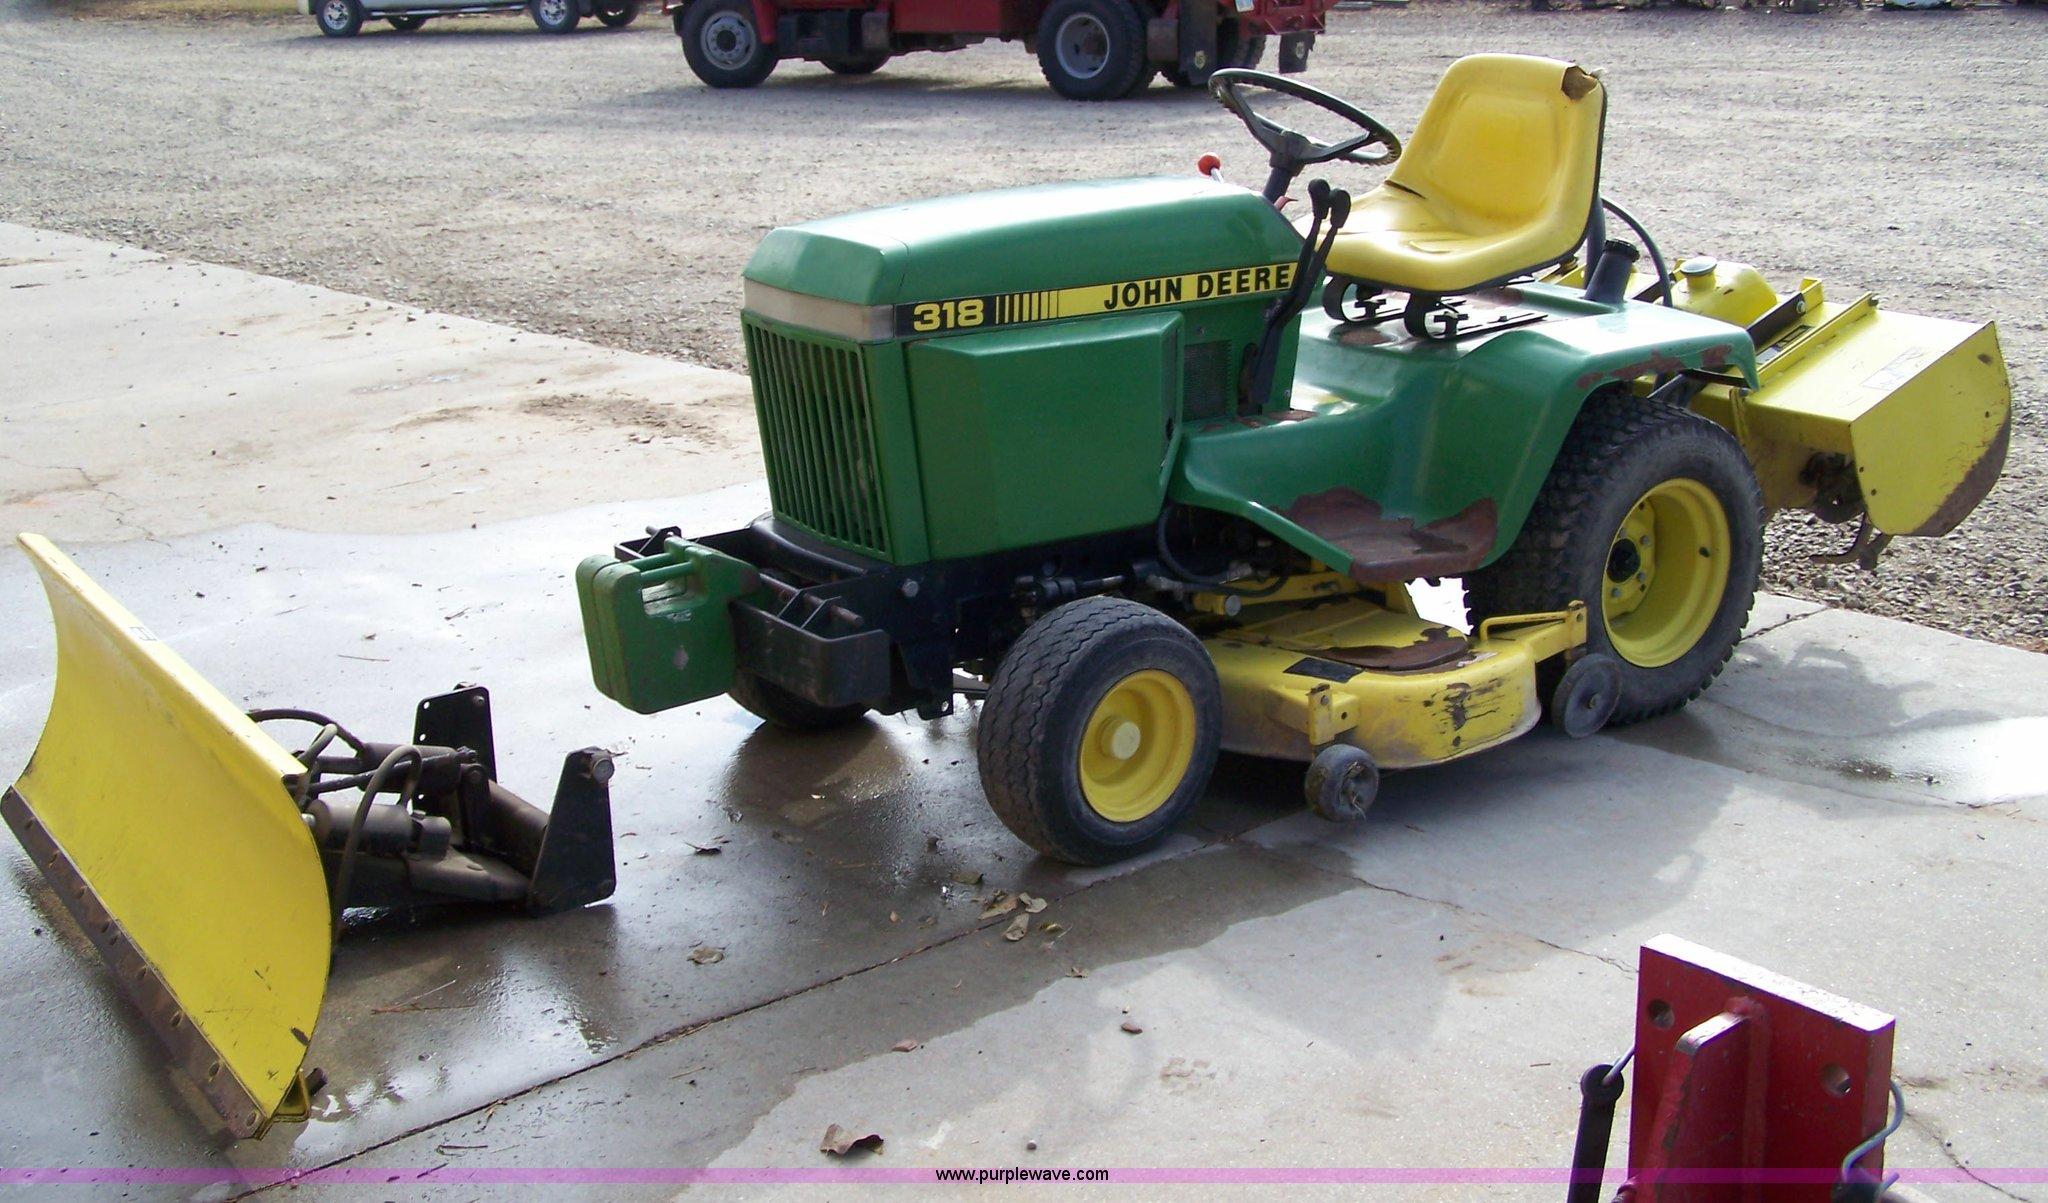 1988 John Deere 318 lawn tractor | Item 7296 | SOLD! Novembe